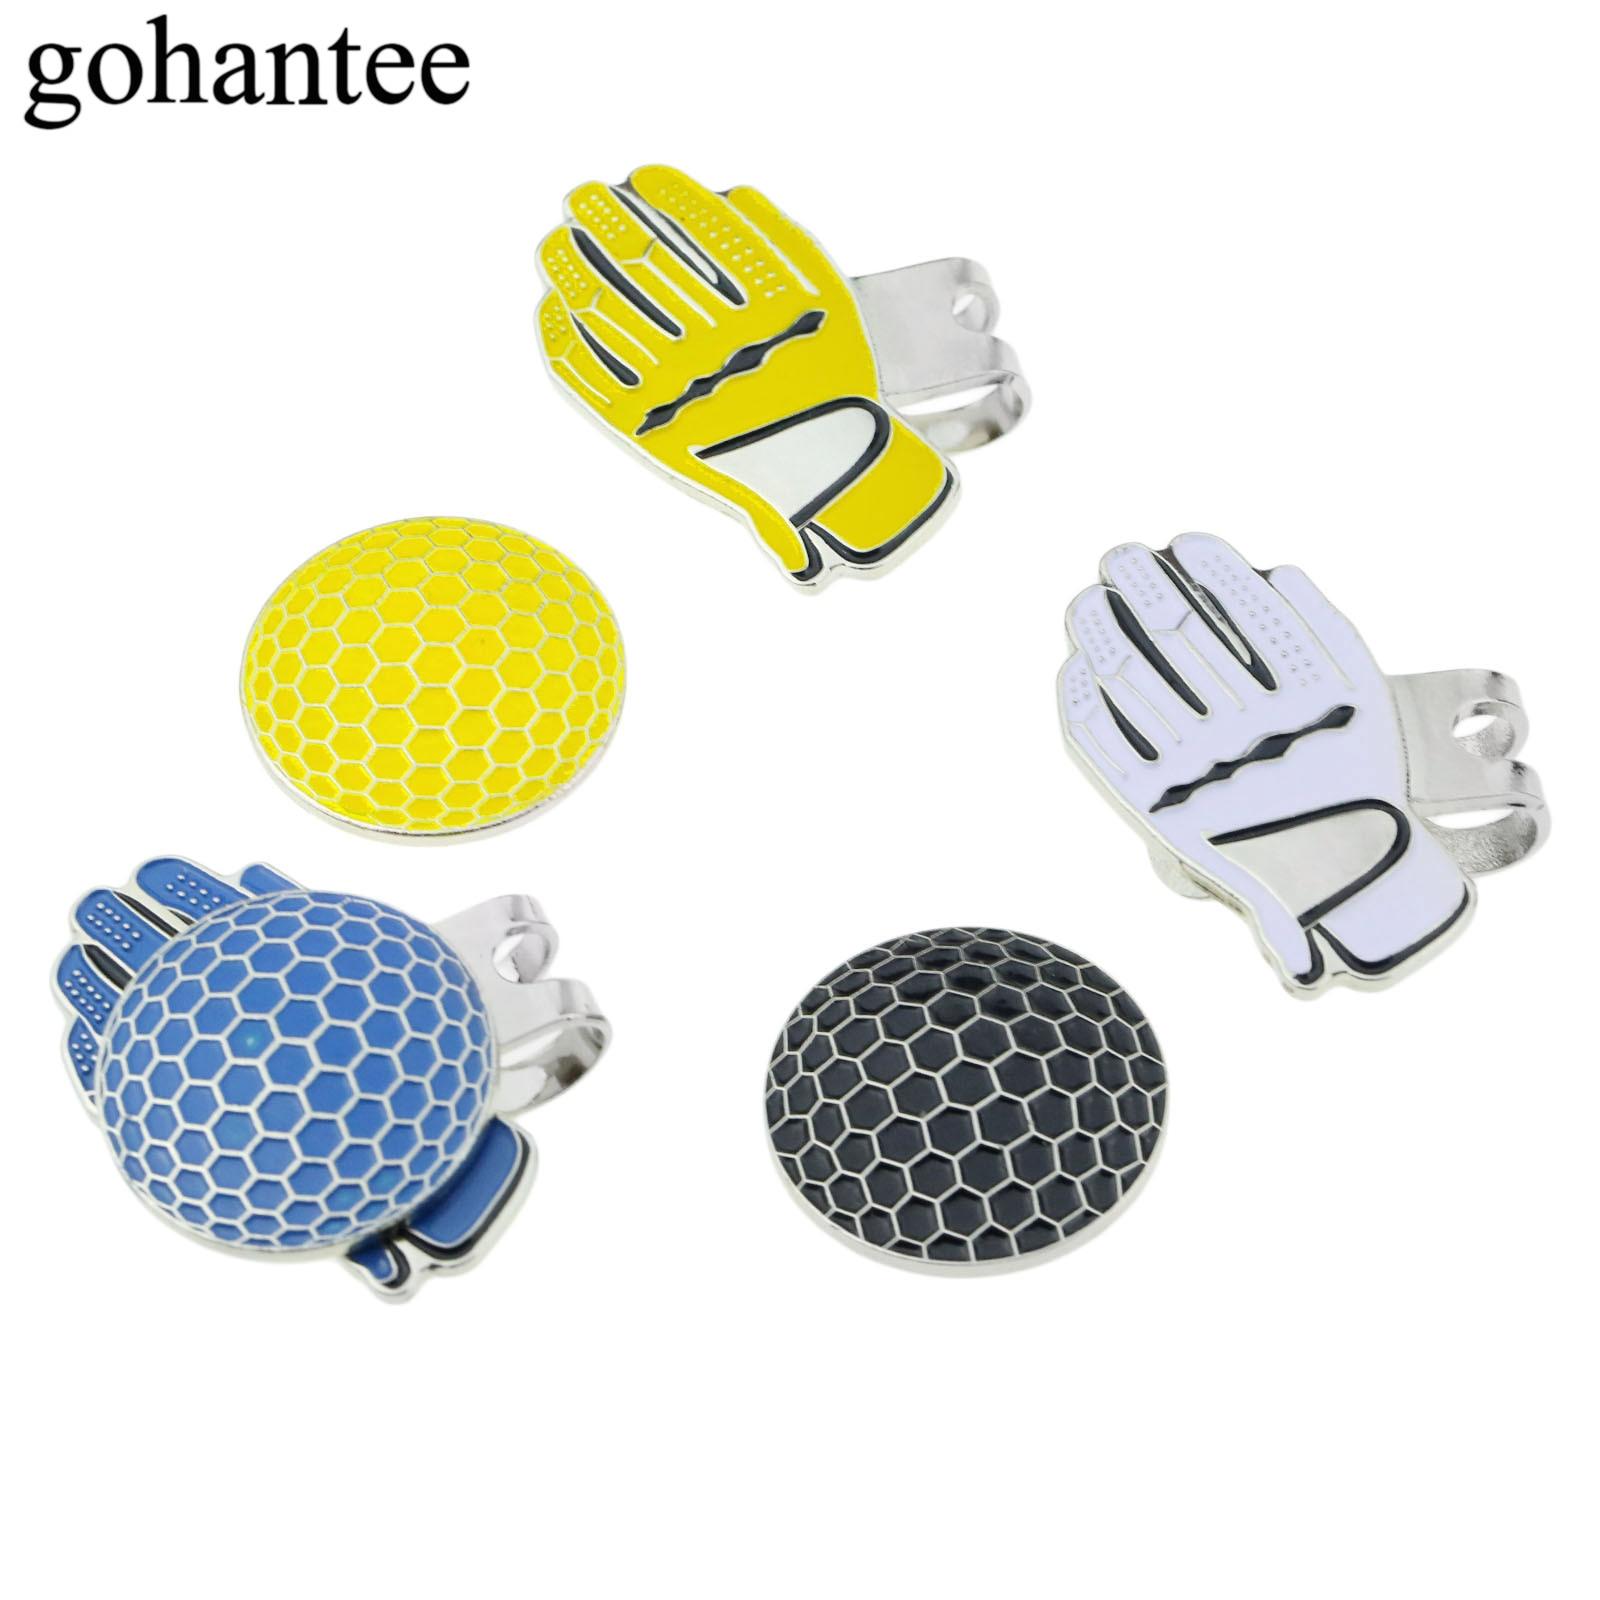 gohantee Outdoor Sports Gloves Shape Golf Hat Visor Clips With Magnetic Golf Balls Mark Pocket Size Alloy Cap/ Hat Decoration